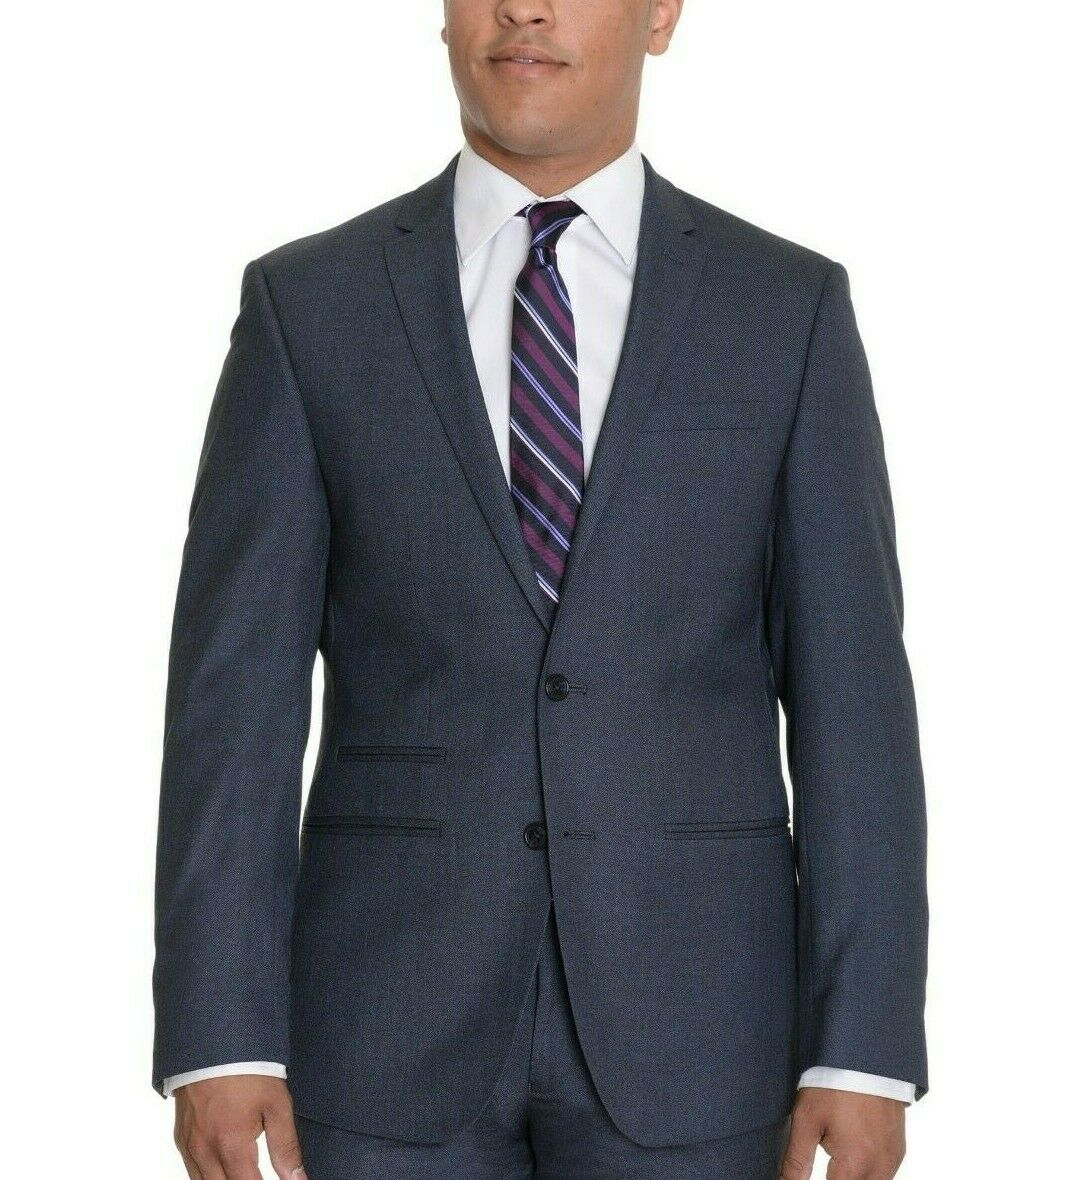 Andrew Fezza Slim Fit bluee Textured Two Button Blazer Sportcoat 38S